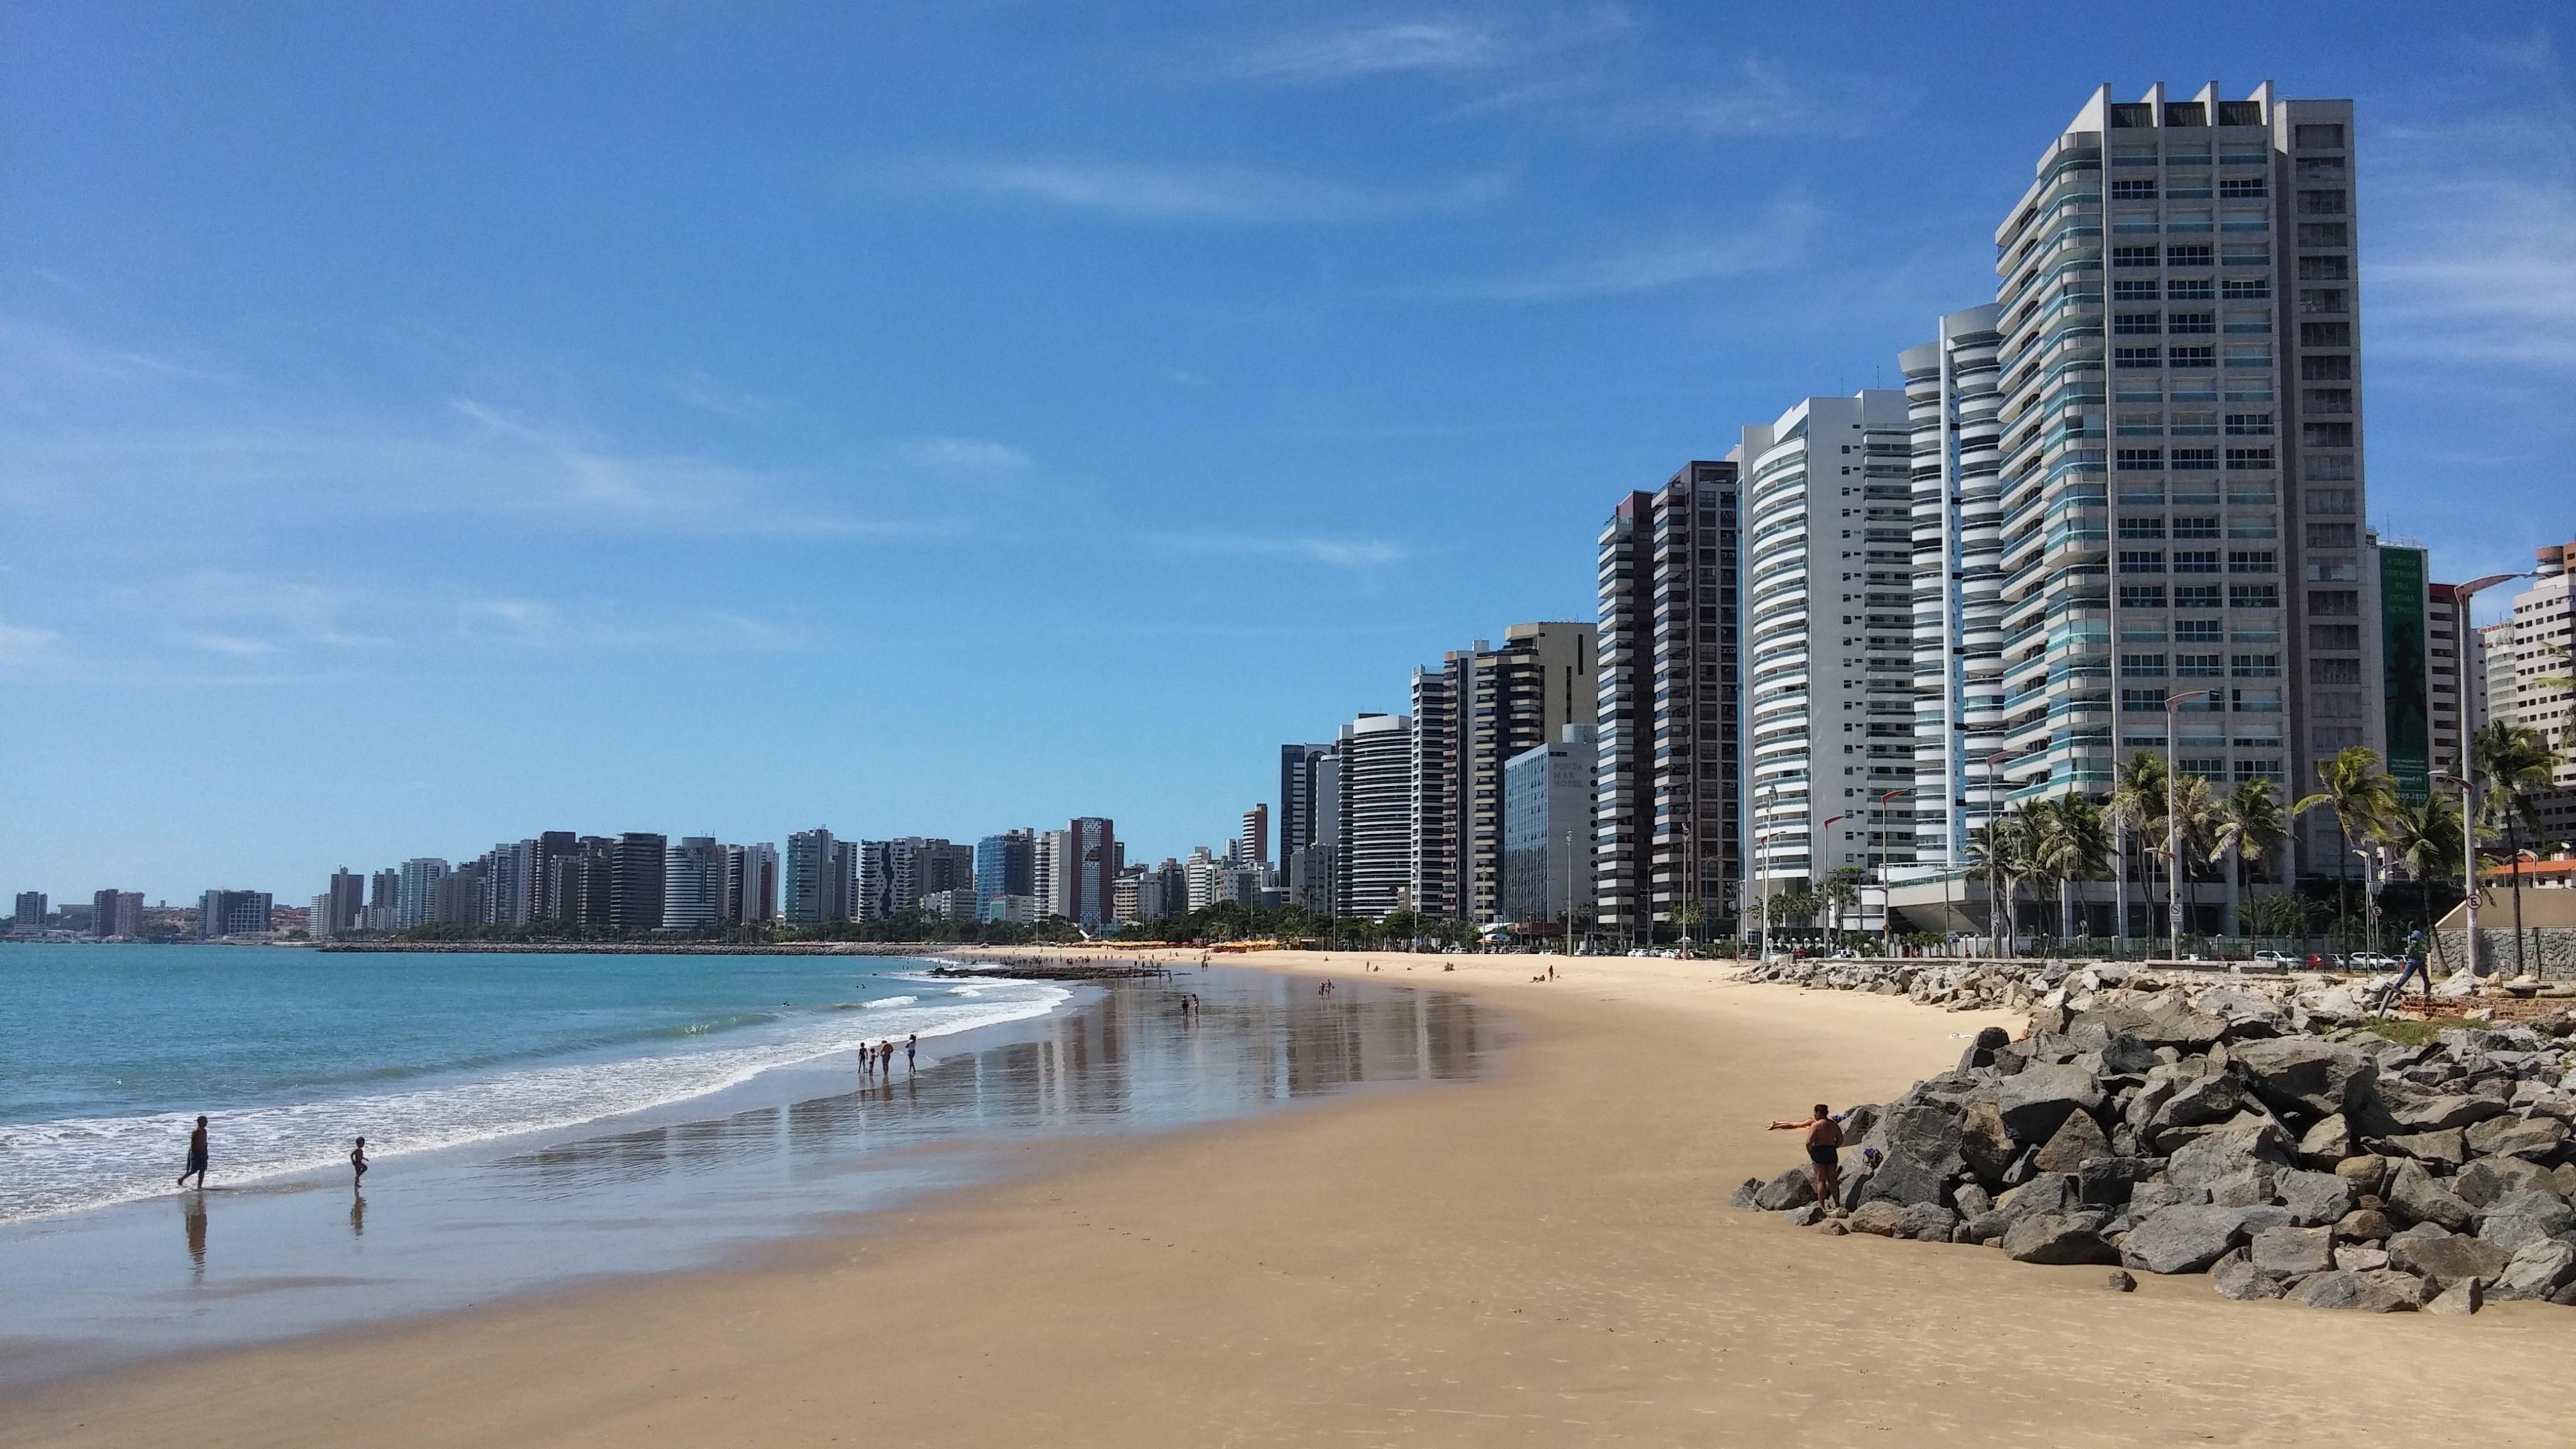 Praia de Iracema, Fortaleza - CE, by Luciana de Paula, 2016